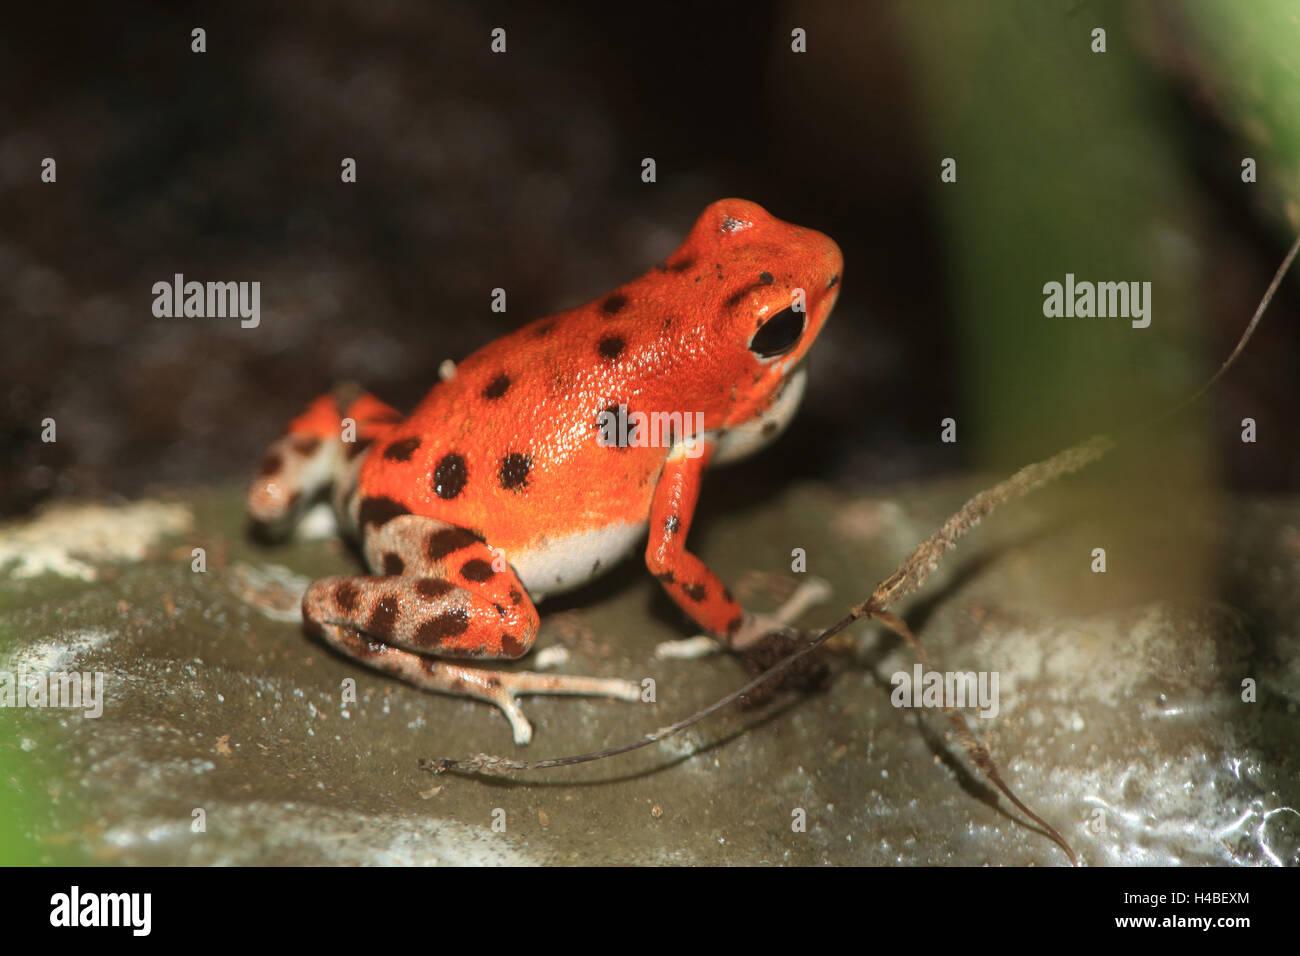 Strawberry poison-dart frog Dendrobates pumilio - Stock Image